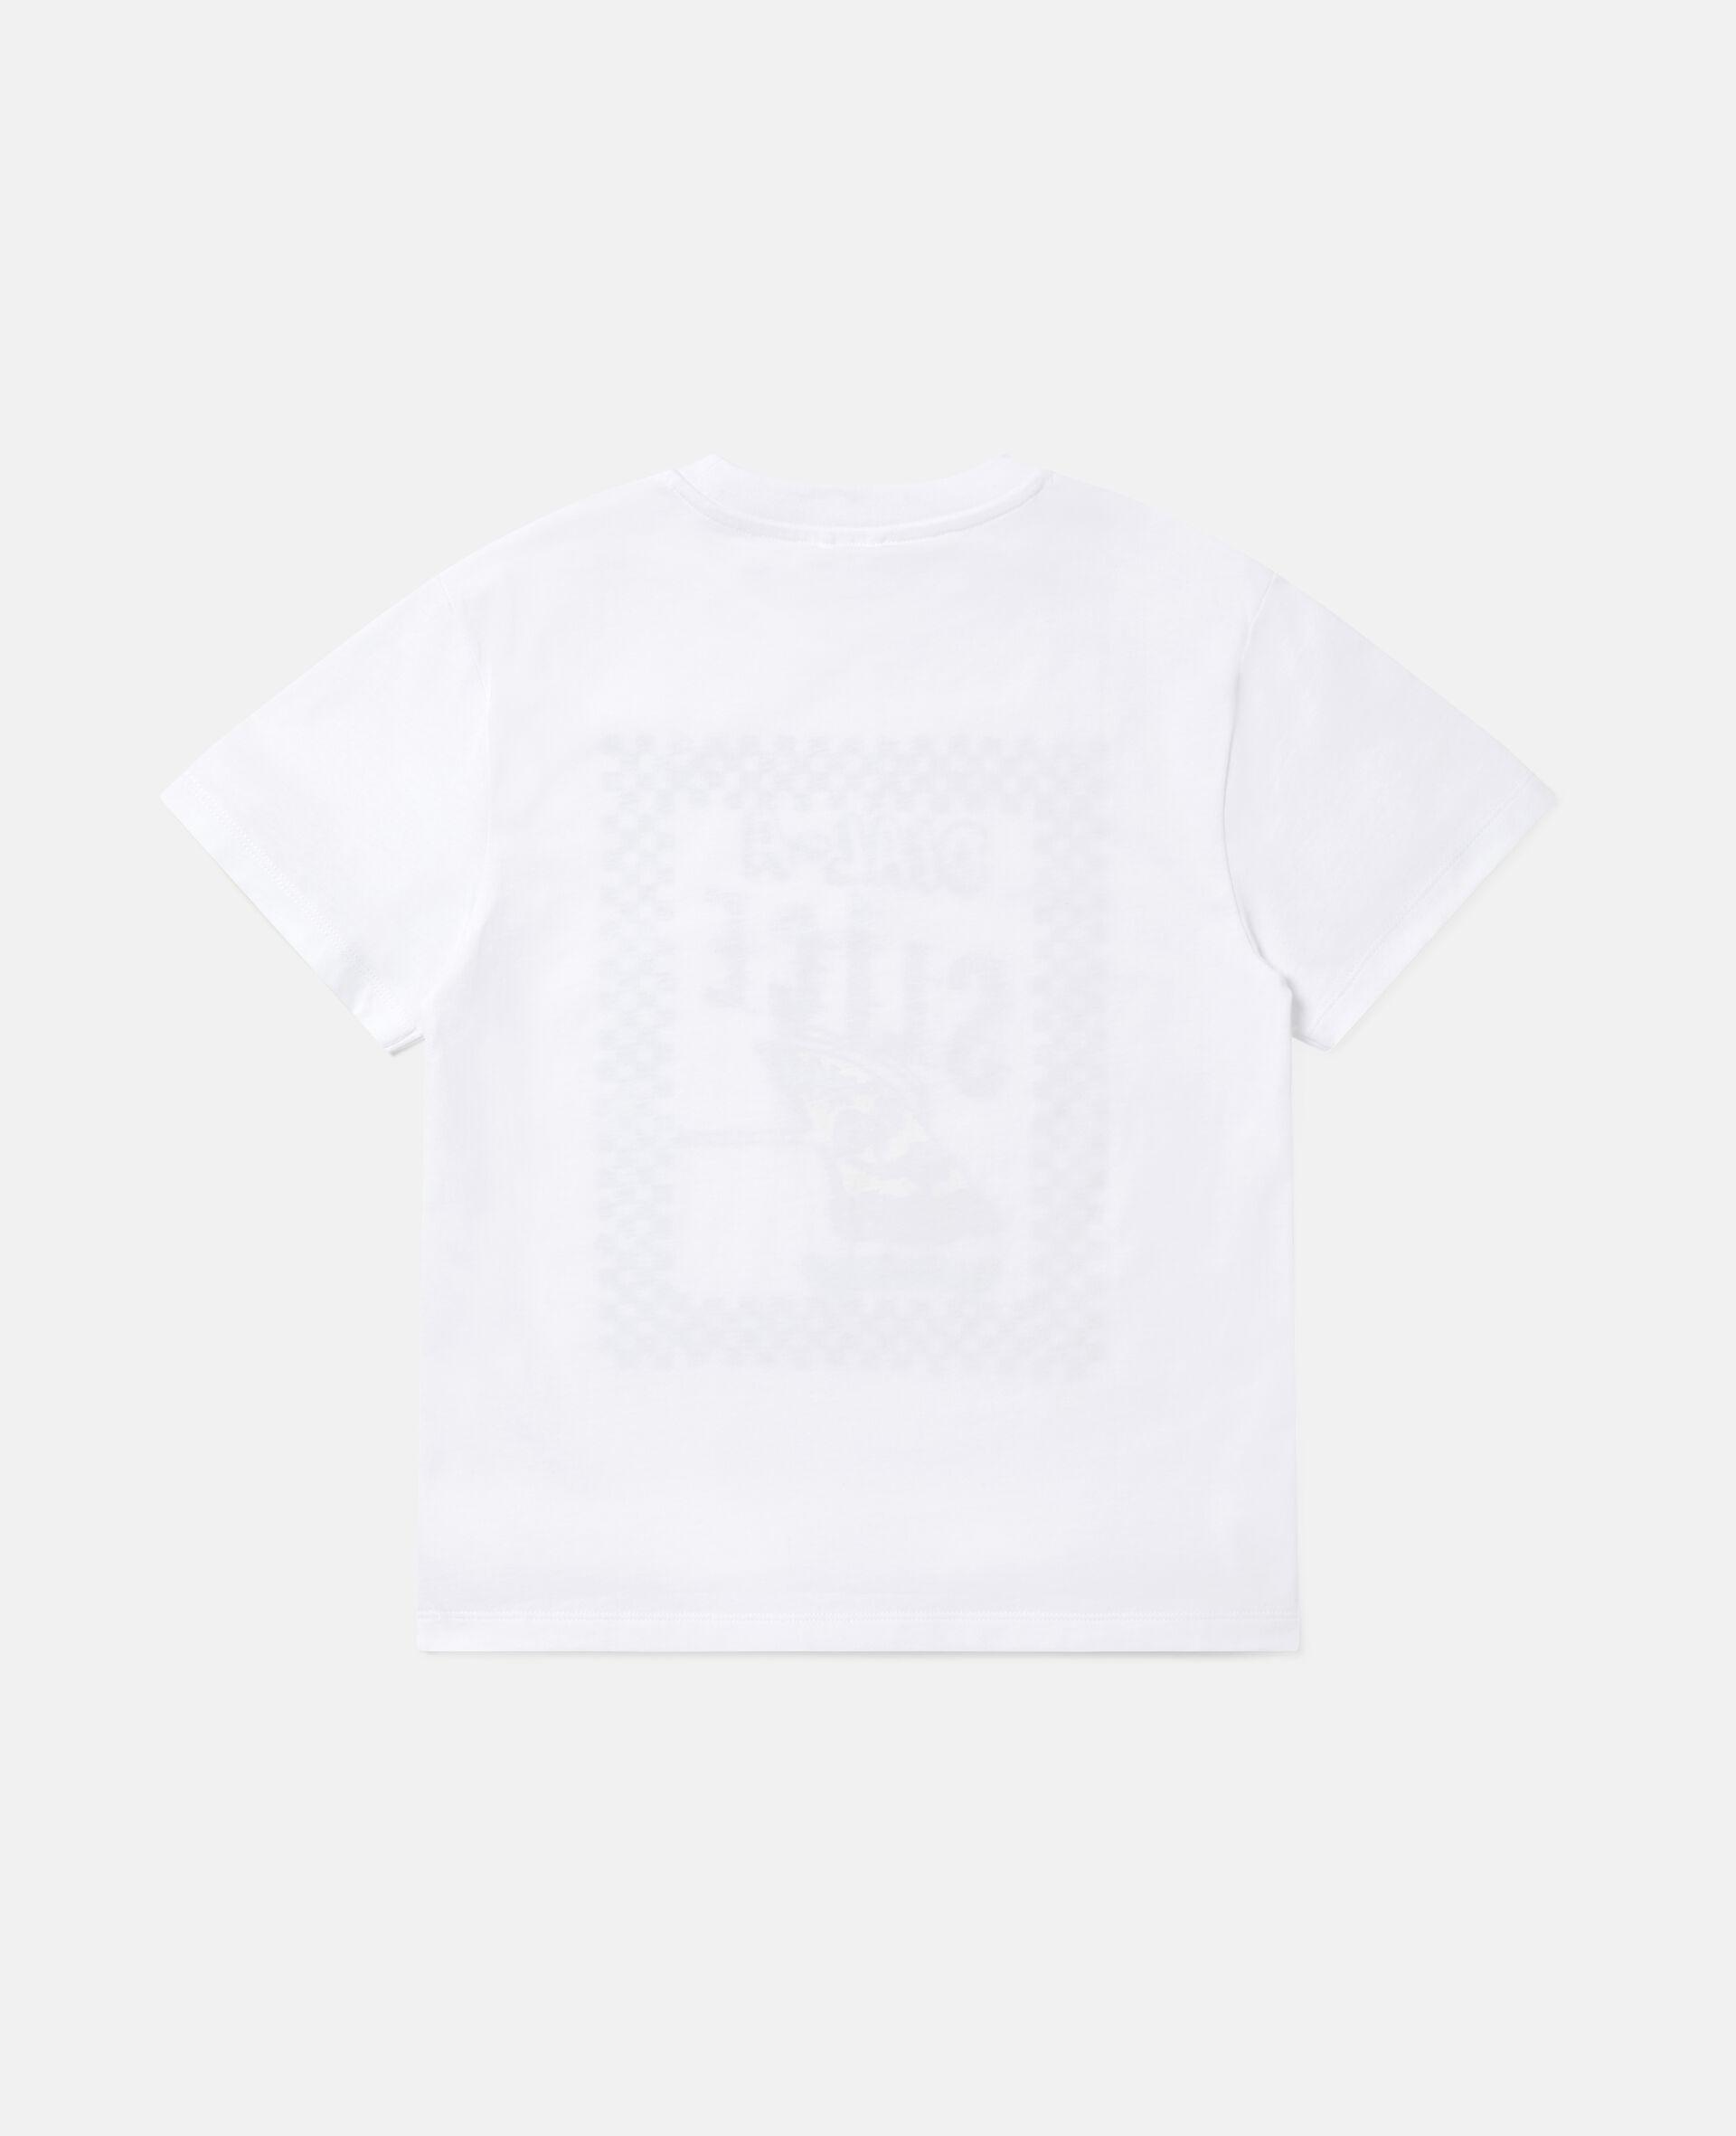 披萨滑板运动员超大号棉质T恤 -白色-large image number 3